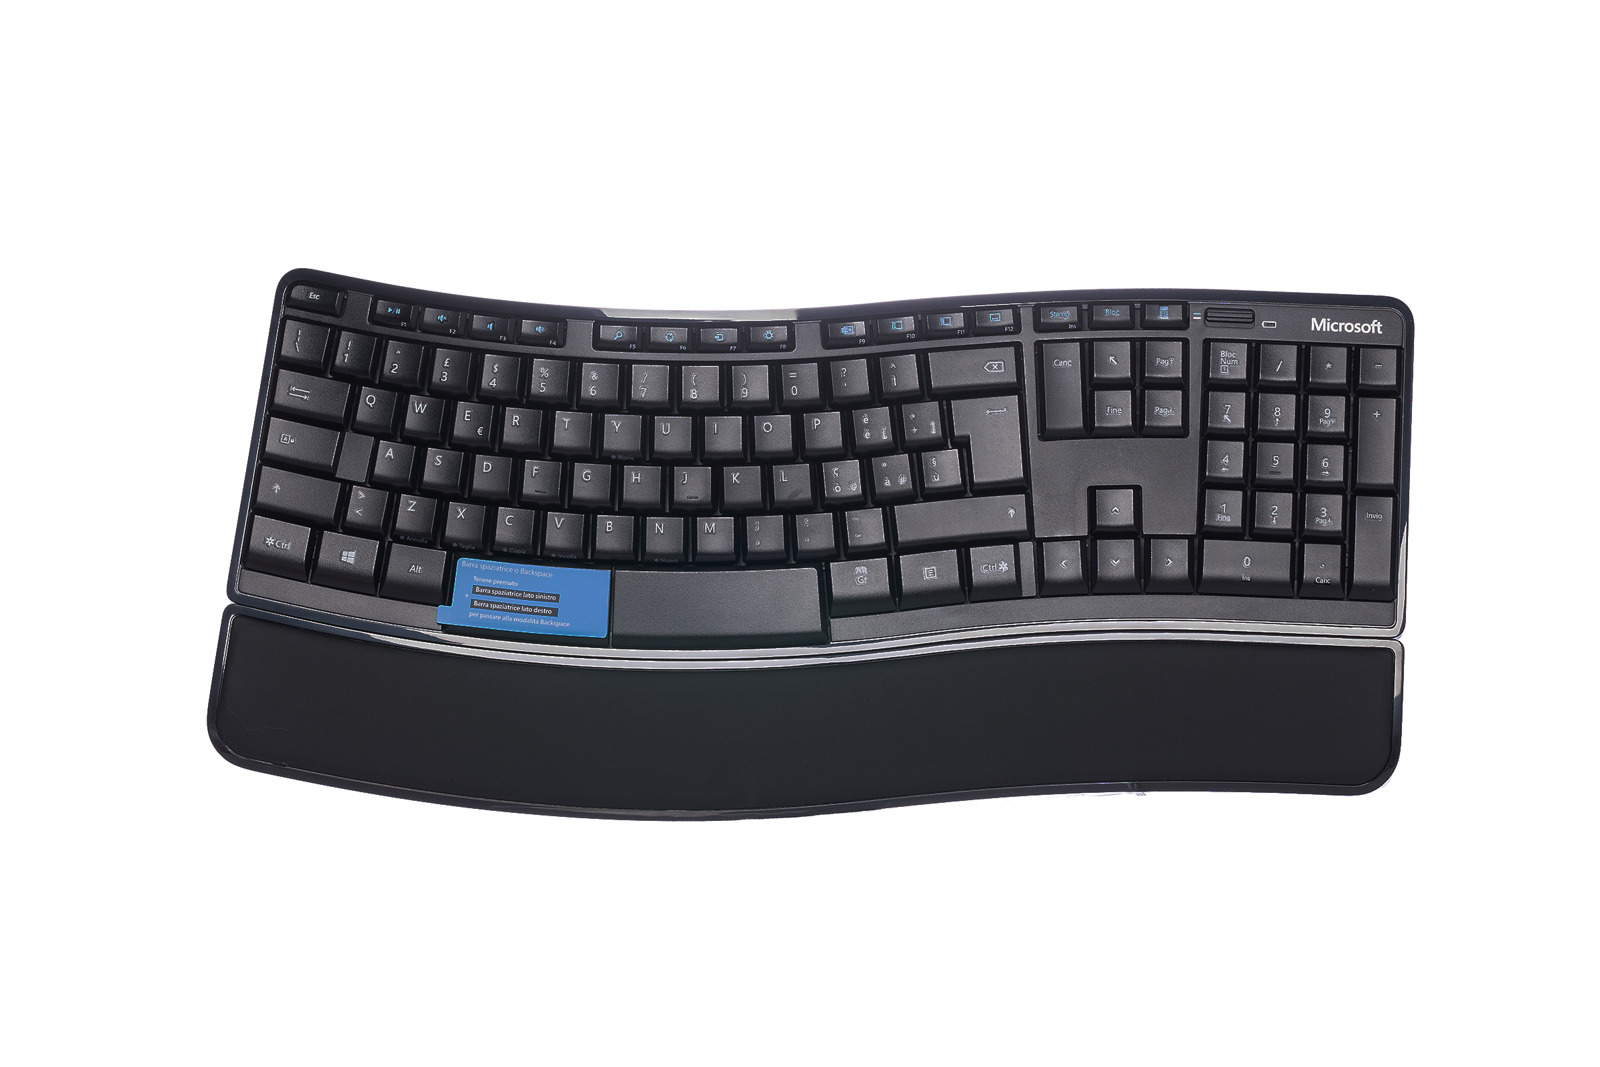 Microsoft Sculpt Comfort (Italienisch) Tastatur V5S-00009 QWERTY